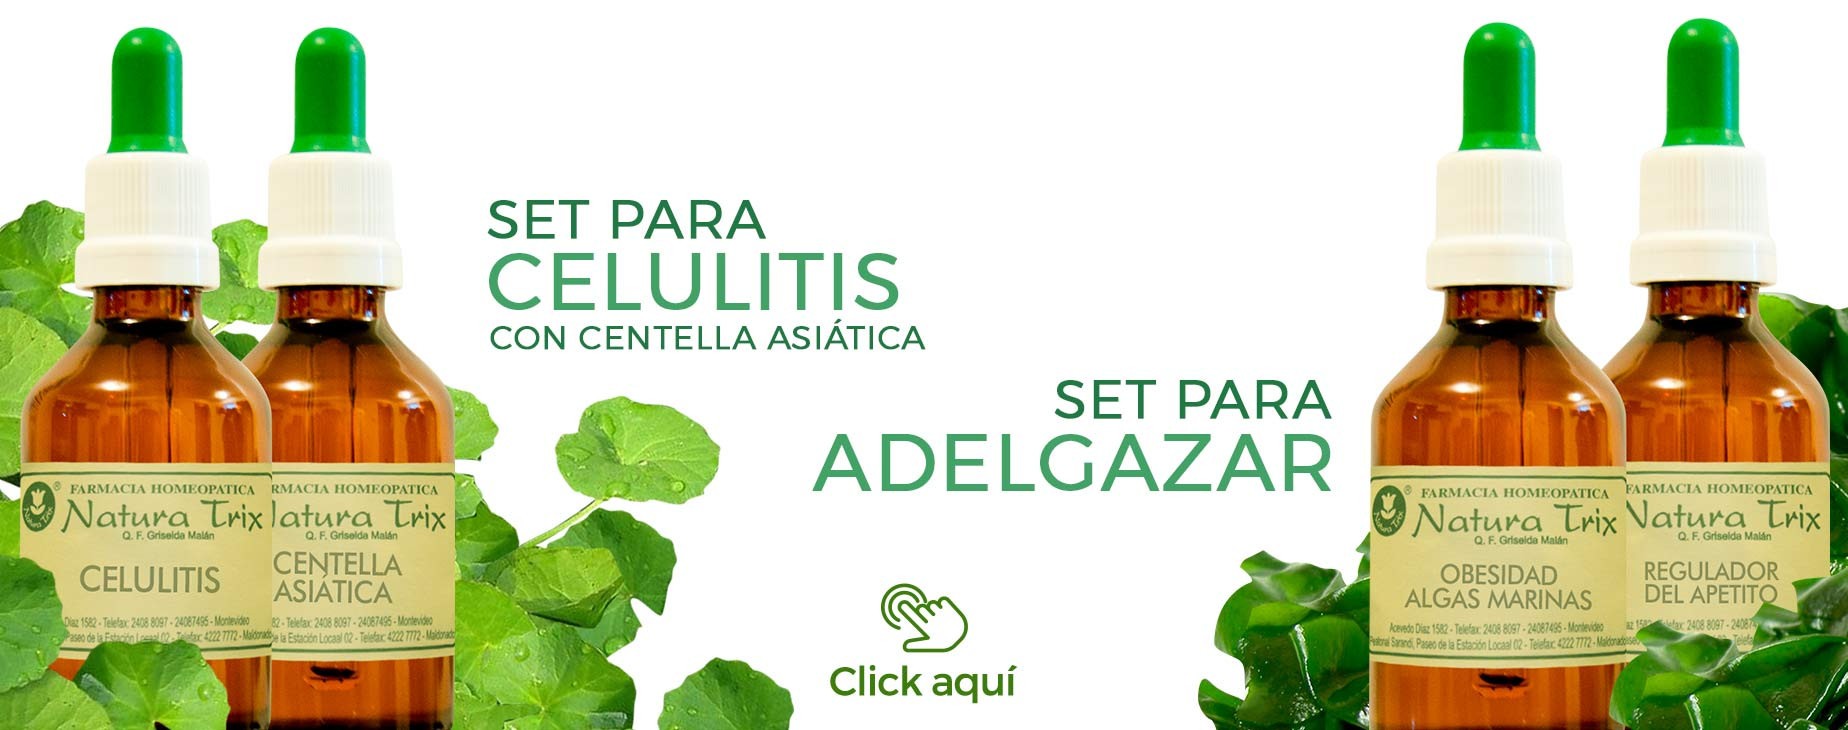 Set para celulitis y adelgazar